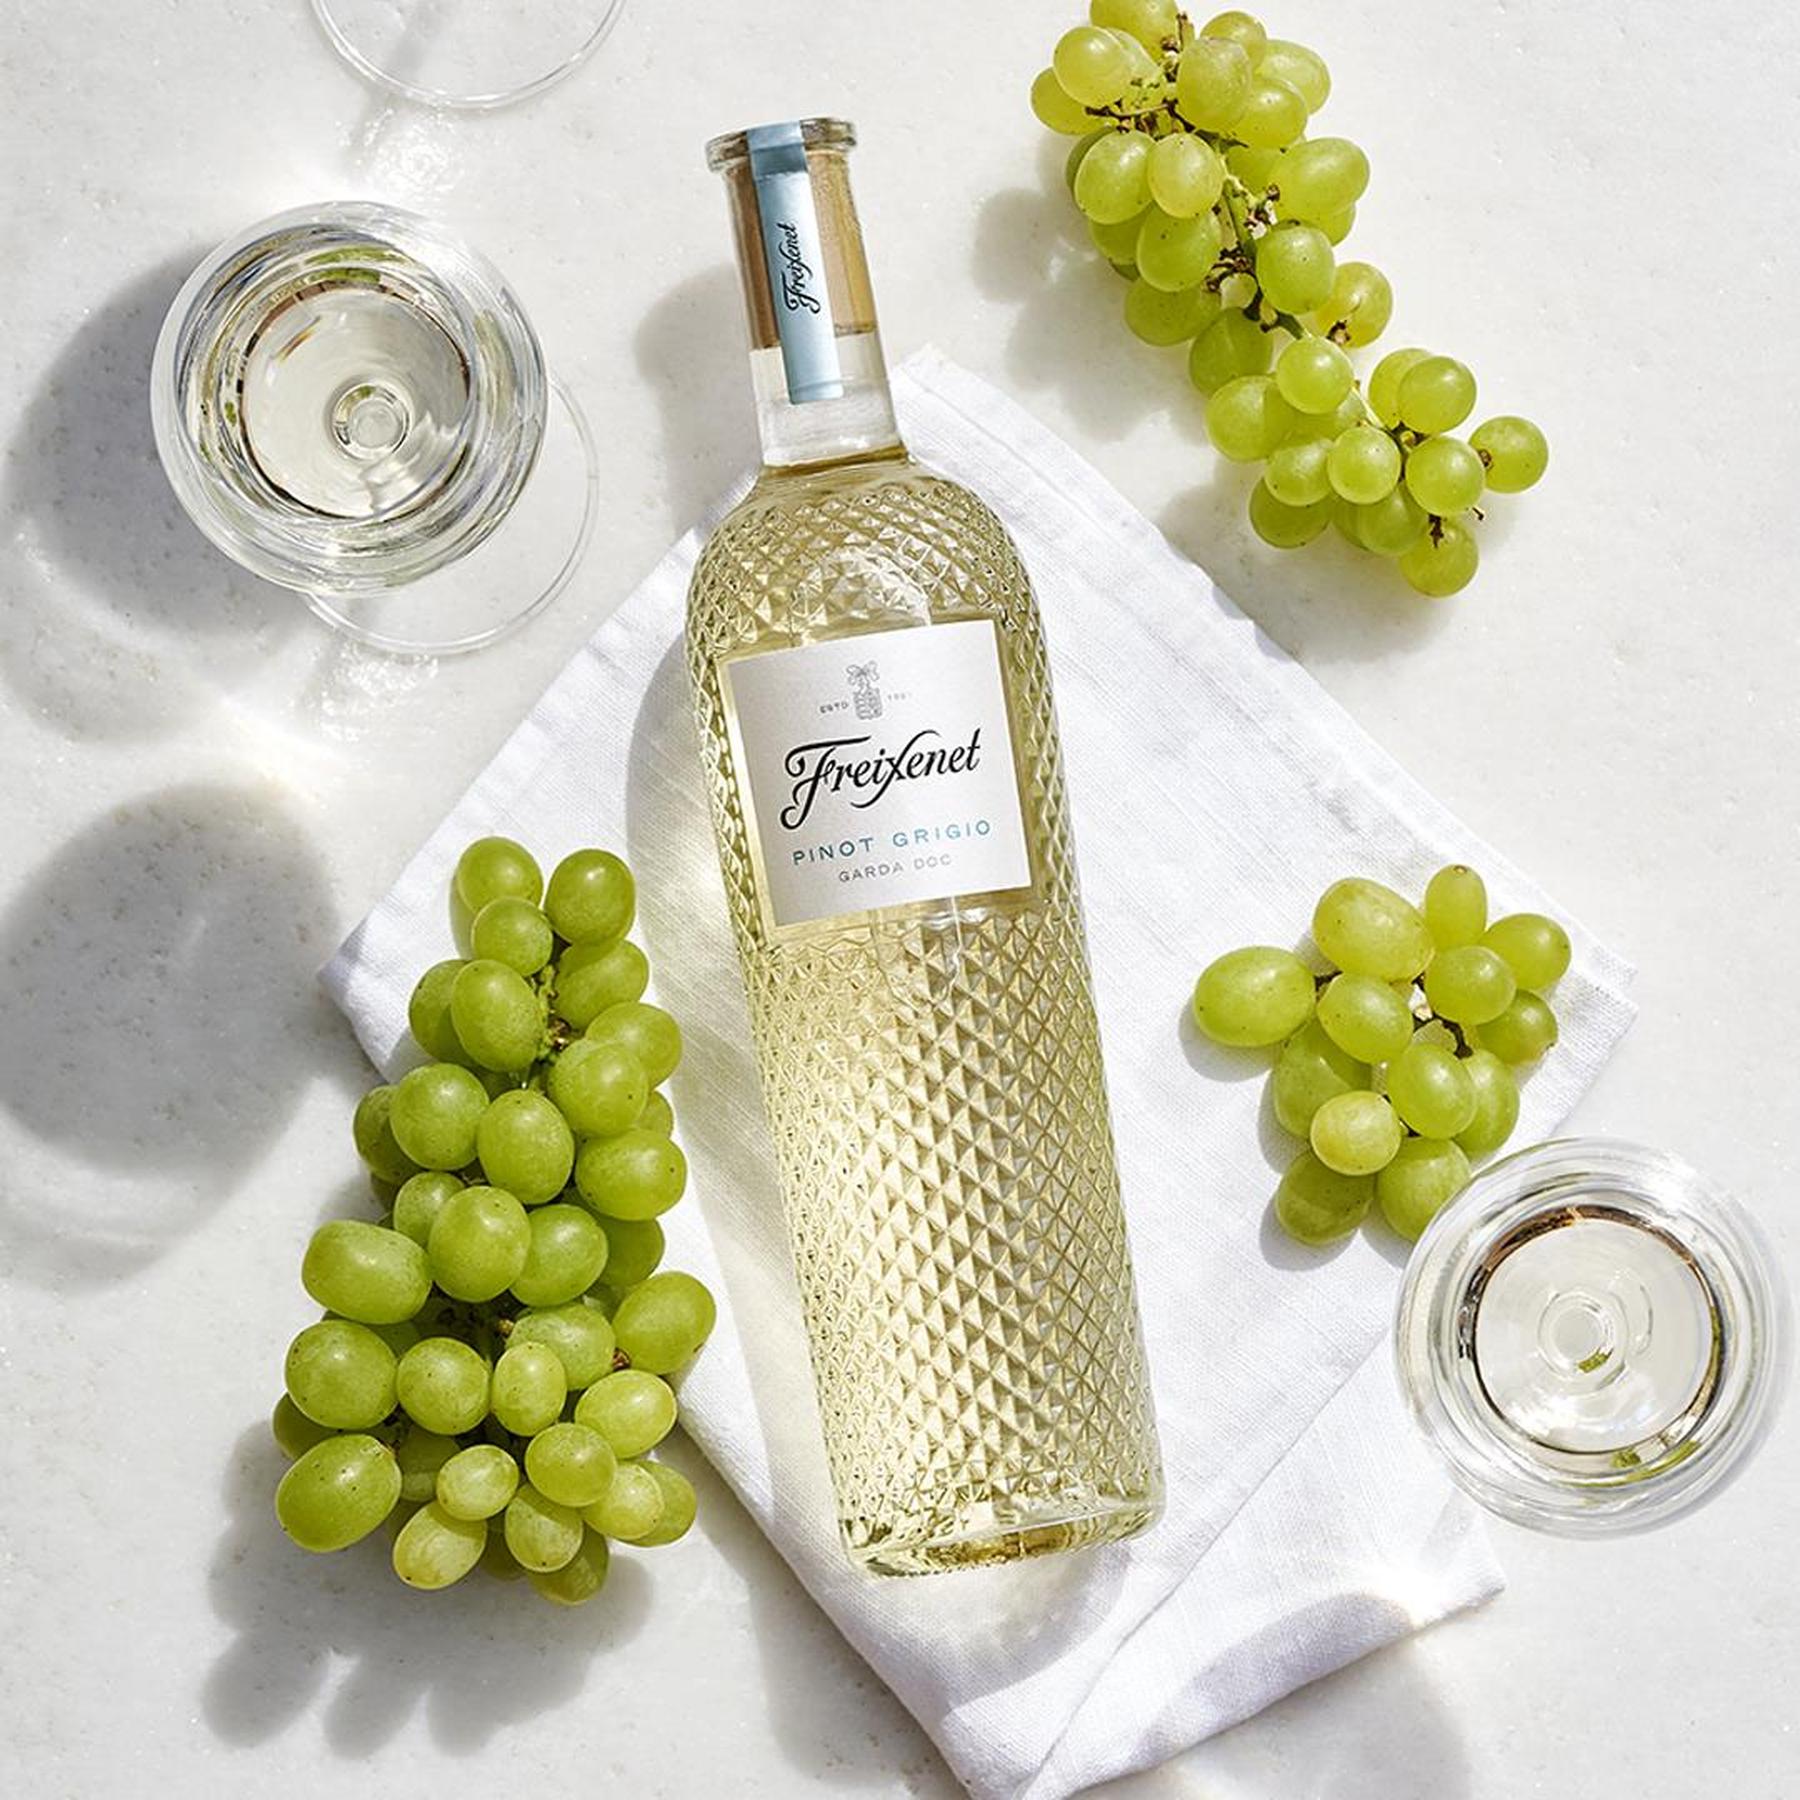 freixenet-diamond-wine-pinot-grigio_5_-15-10-2020-14-17-34.png